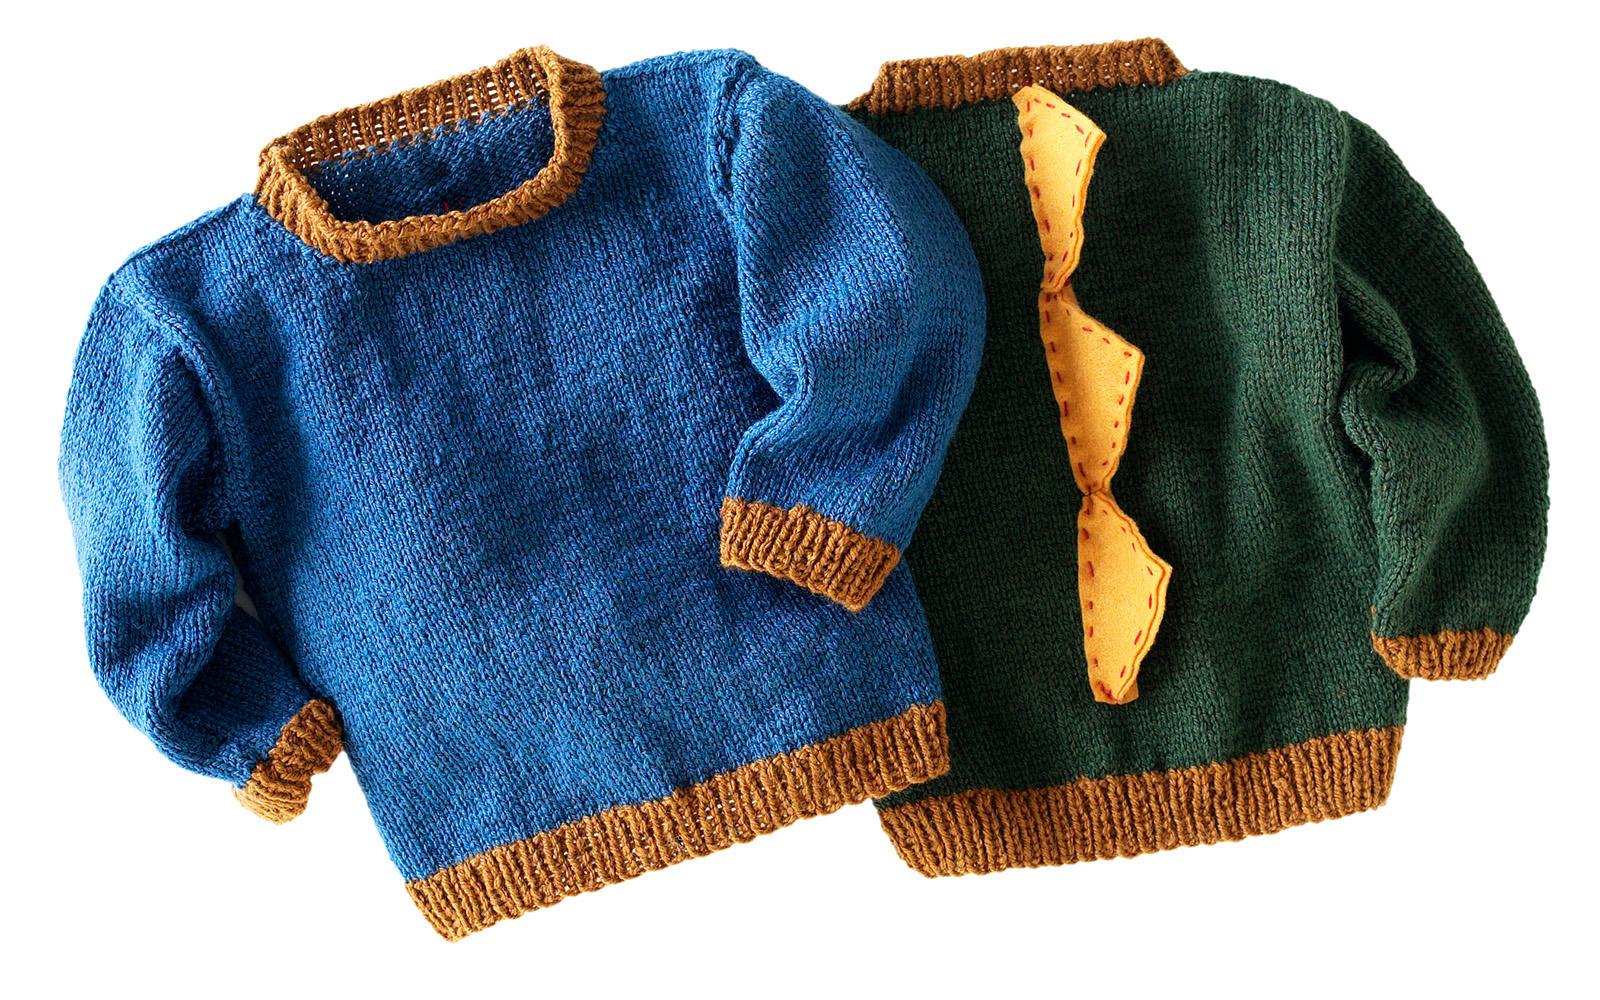 Sweater_Laydown.jpg